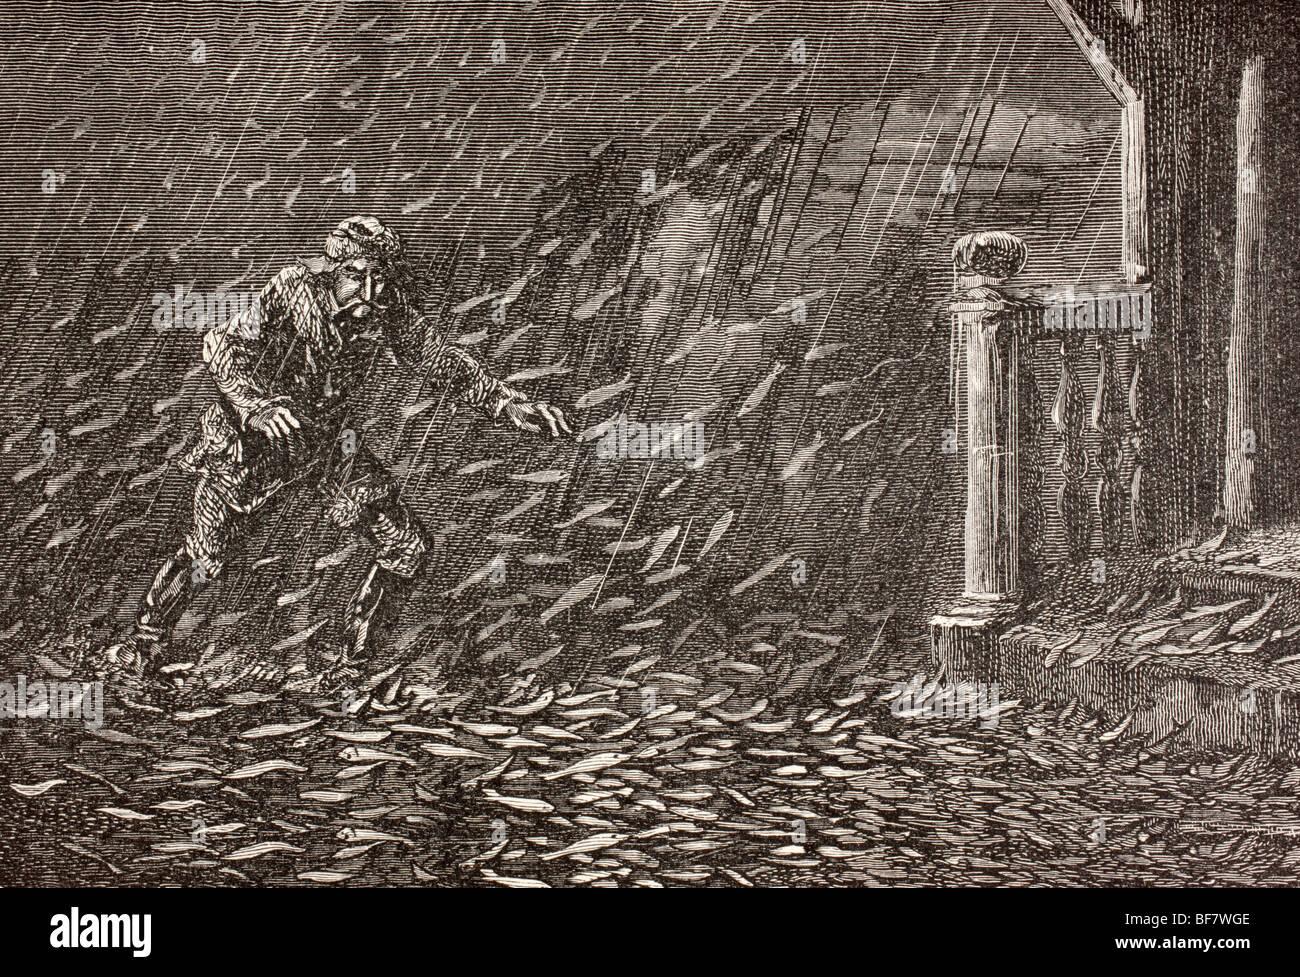 A shower of fish in Transylvania, Romania - Stock Image